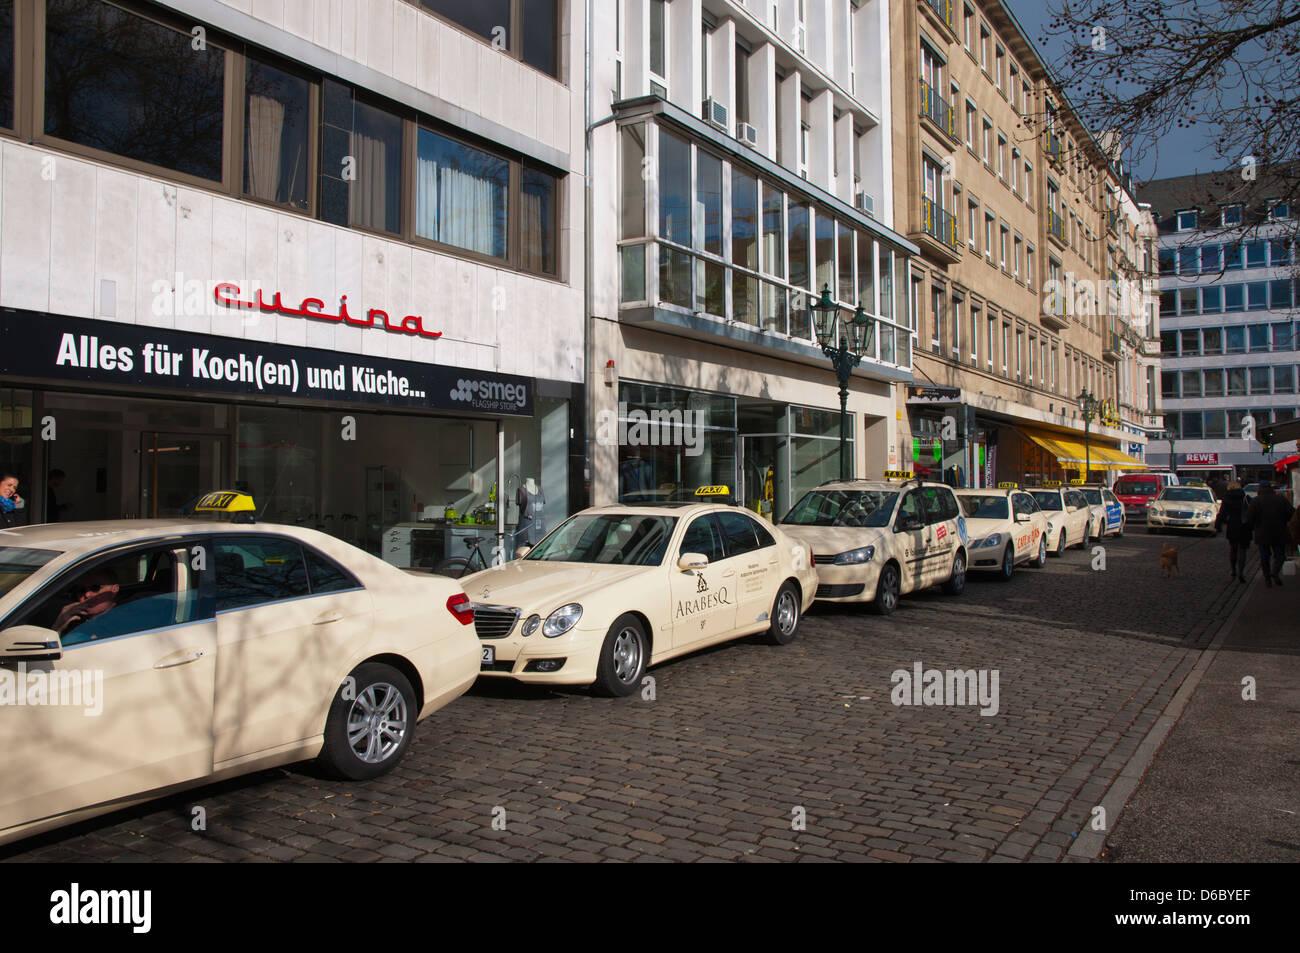 german taxi stand stockfotos german taxi stand bilder alamy. Black Bedroom Furniture Sets. Home Design Ideas